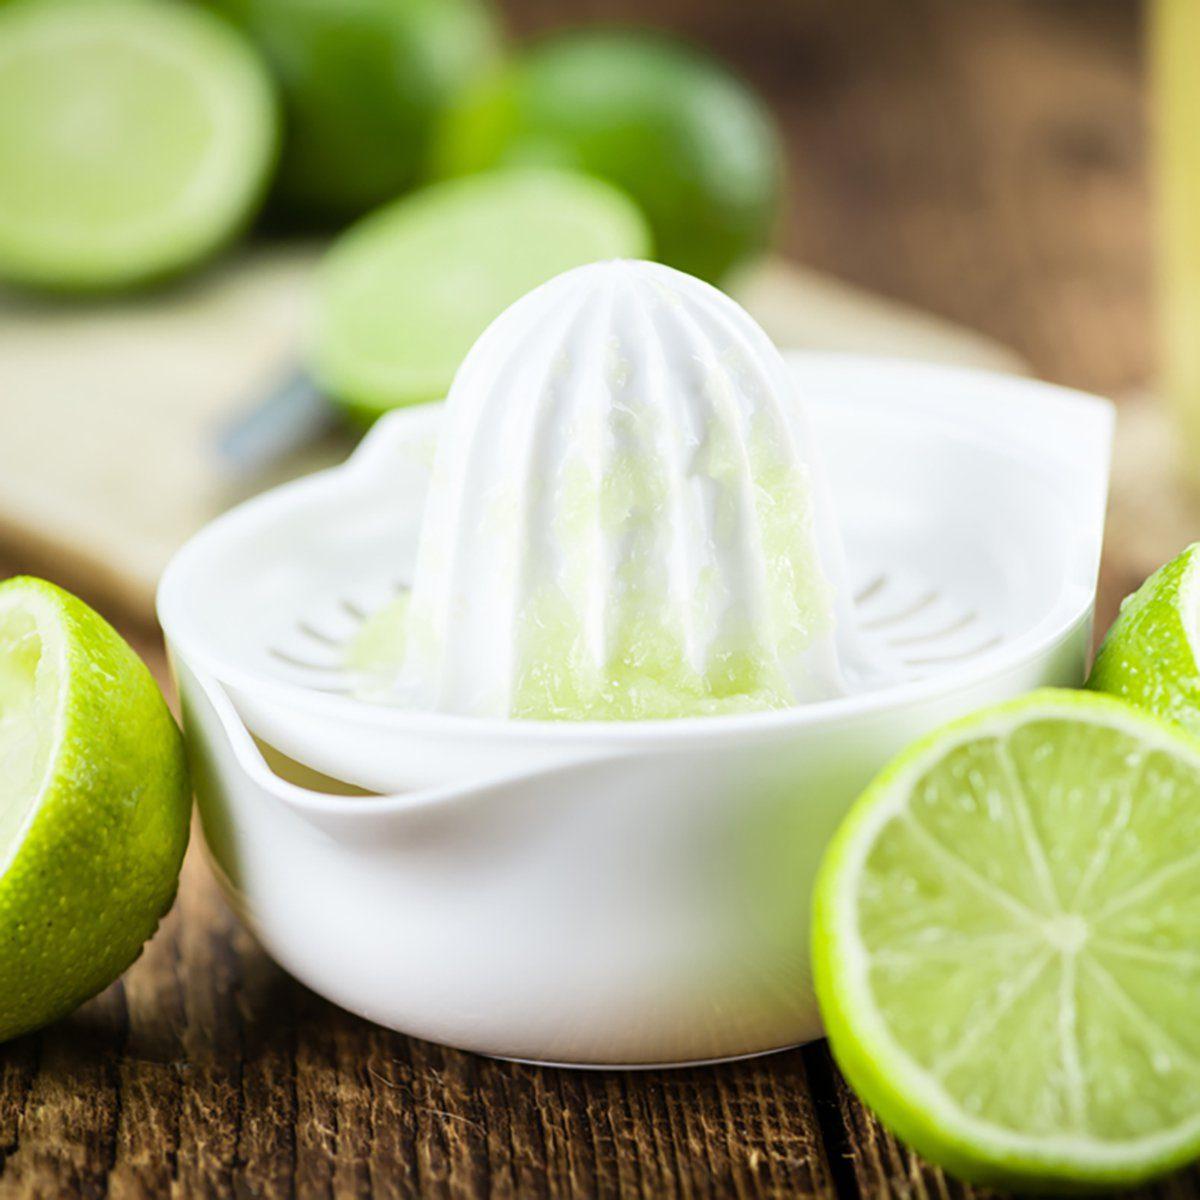 Lime Juice on a vintage background